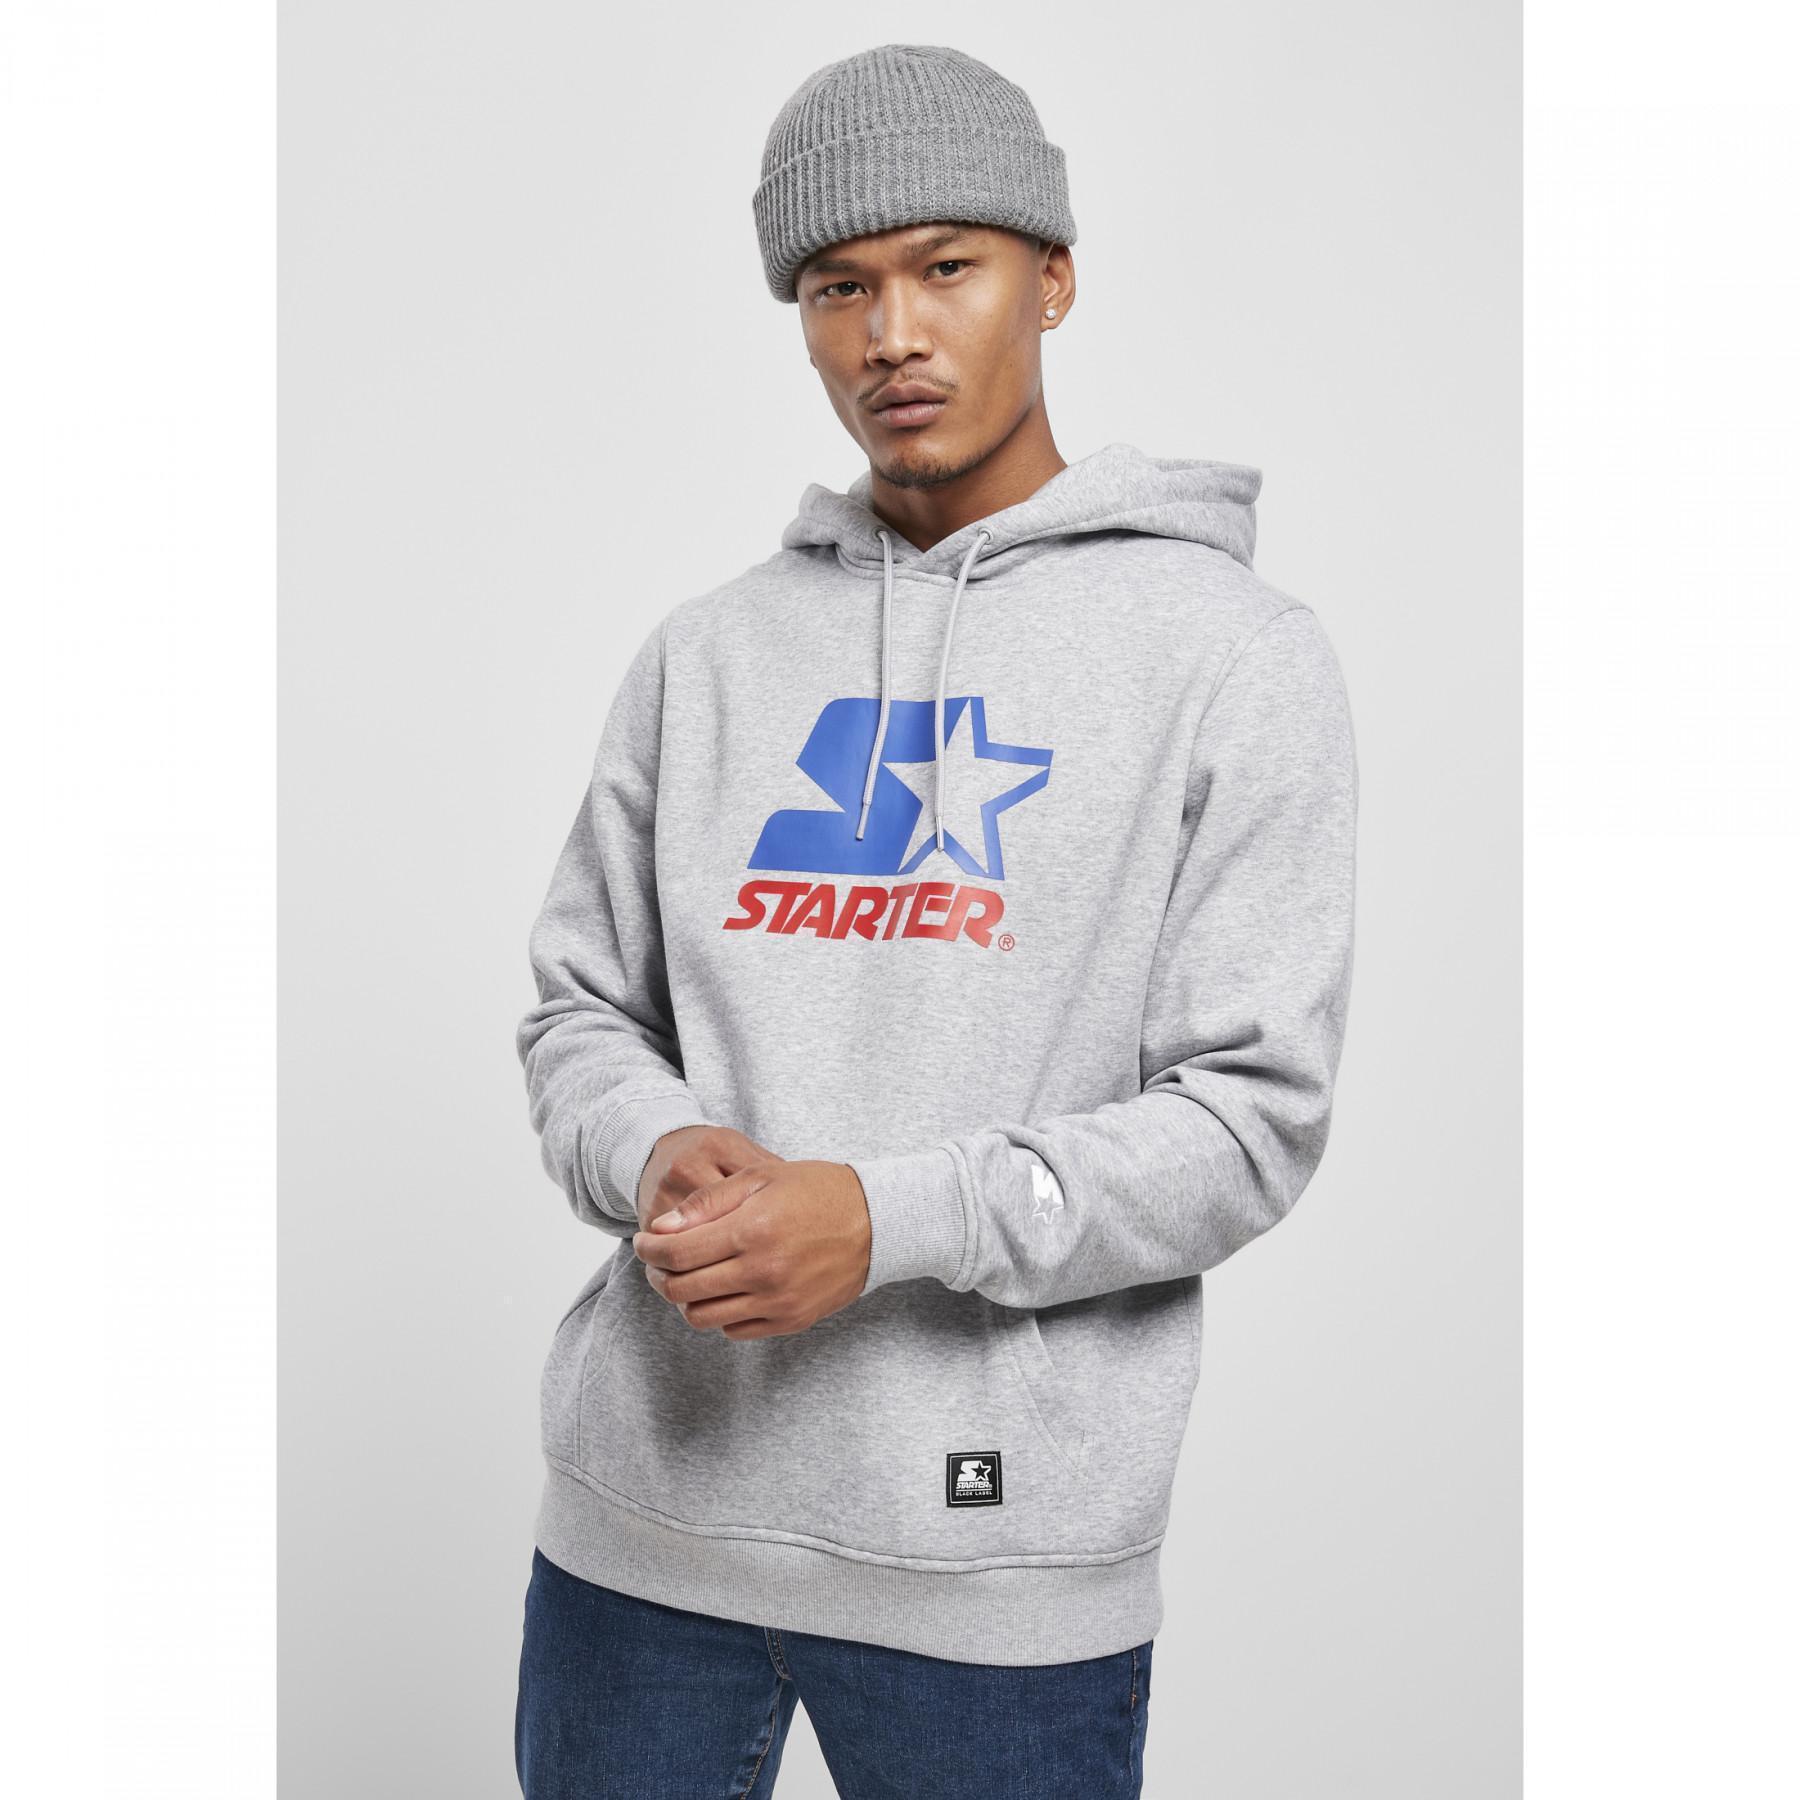 Sweatshirt Urban Classics starter two color logo